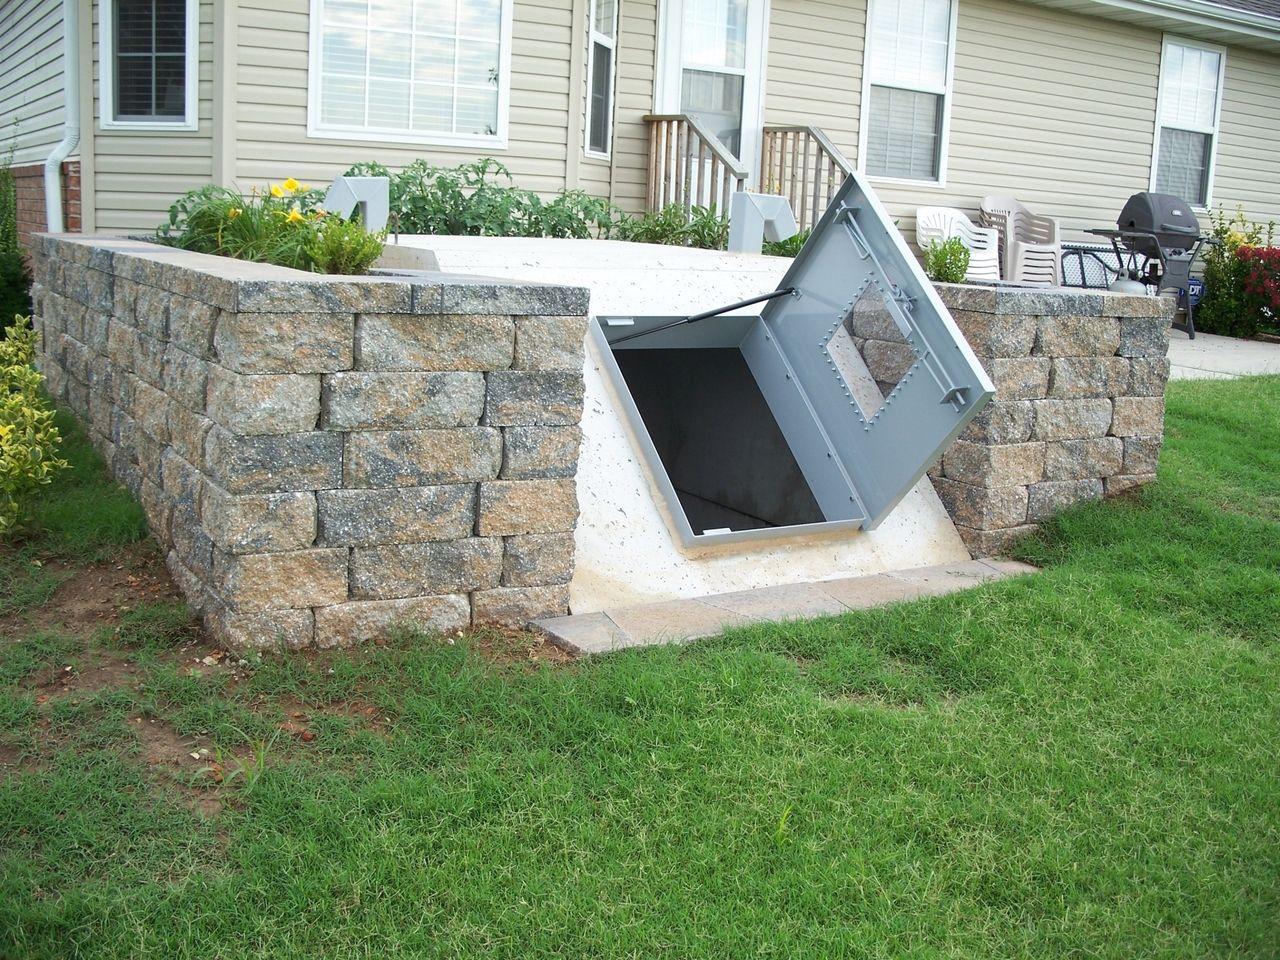 Как построить погреб на даче своими руками поэтапно фото фото 373